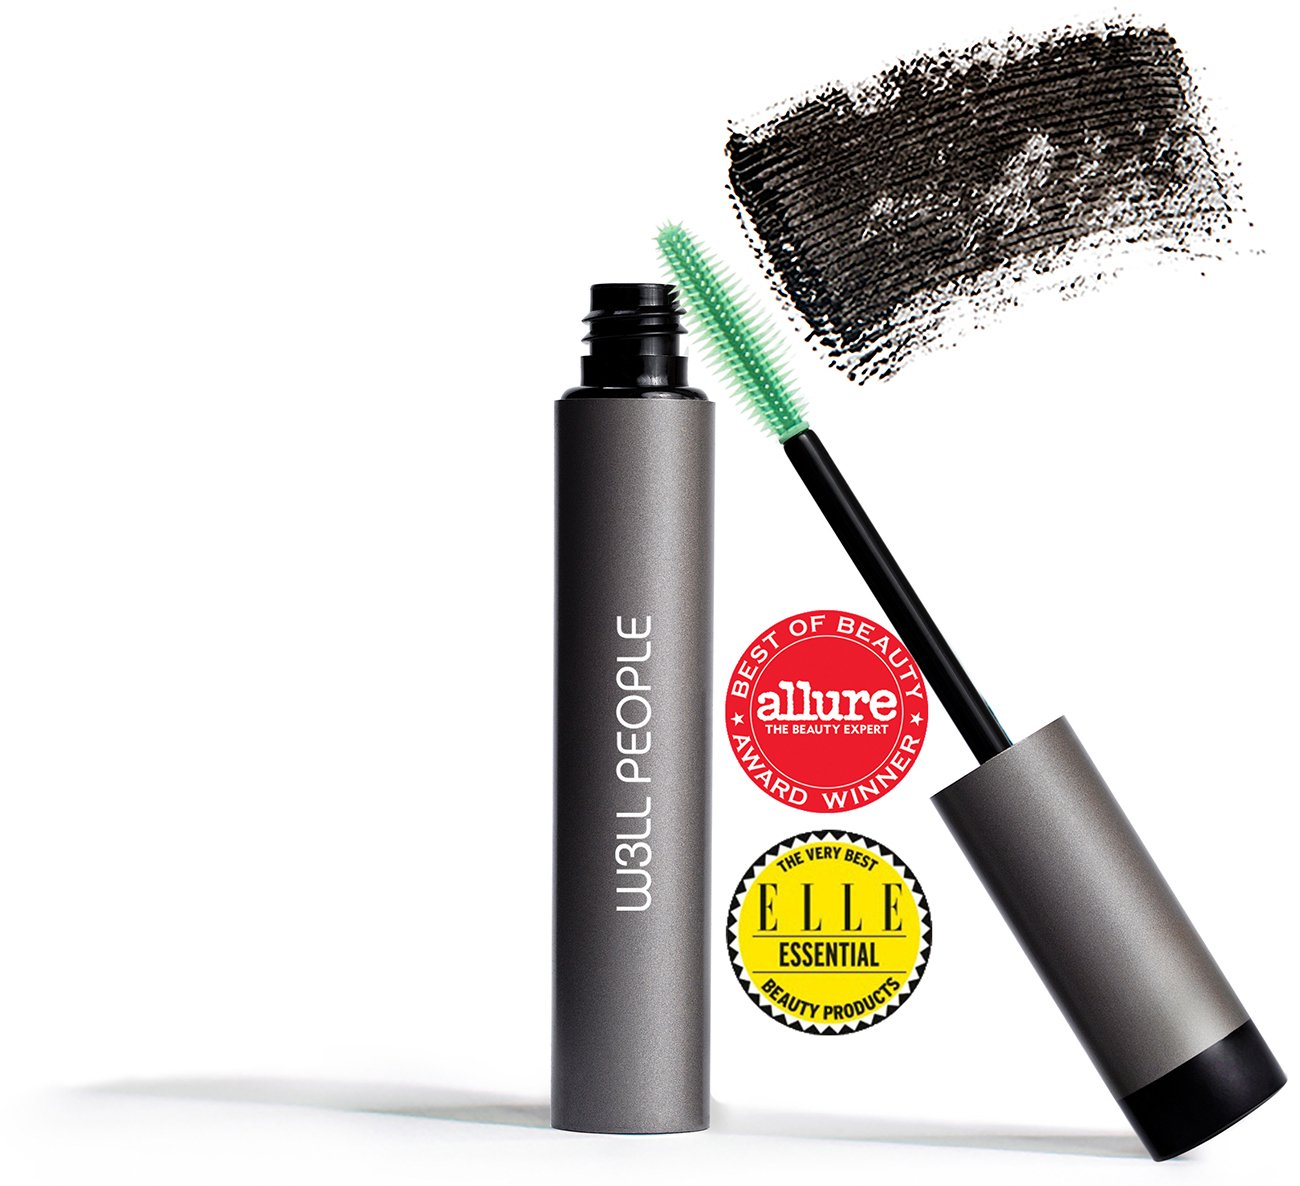 W3LL PEOPLE - Natural Expressionist Mascara (PRO BLACK)